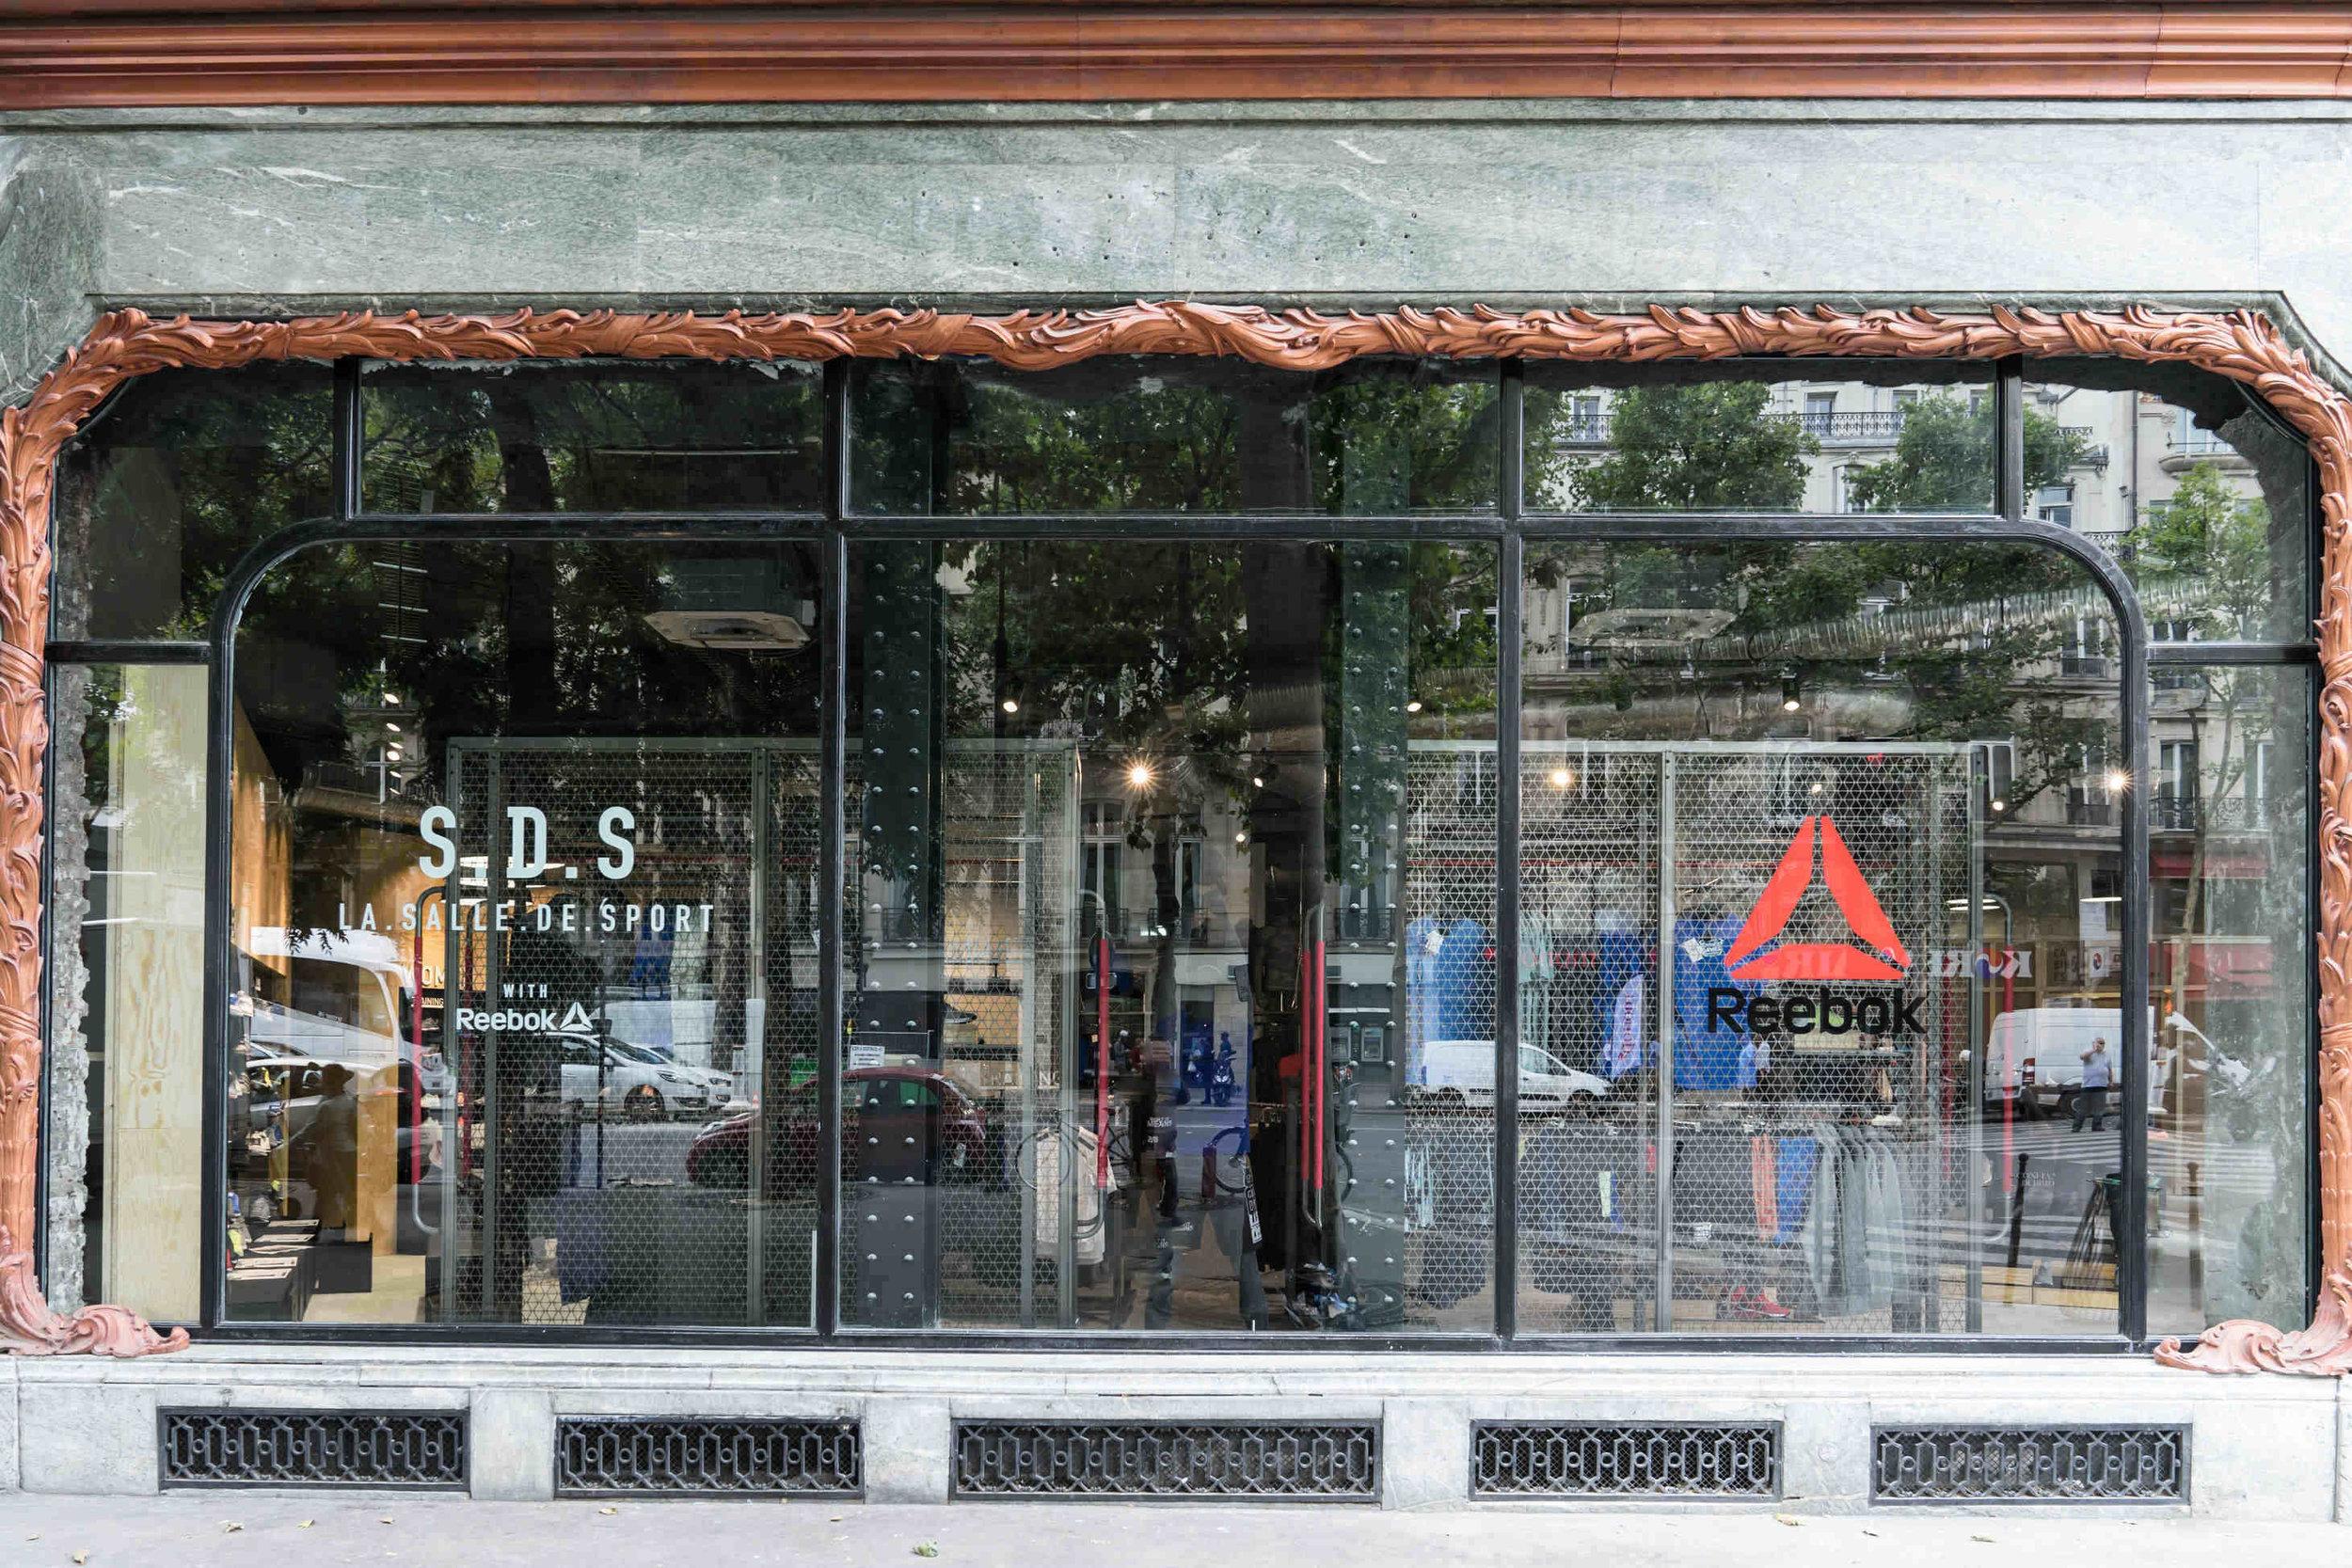 LA. SALLE. DE. SPORT Reebok Store Actual Exterior